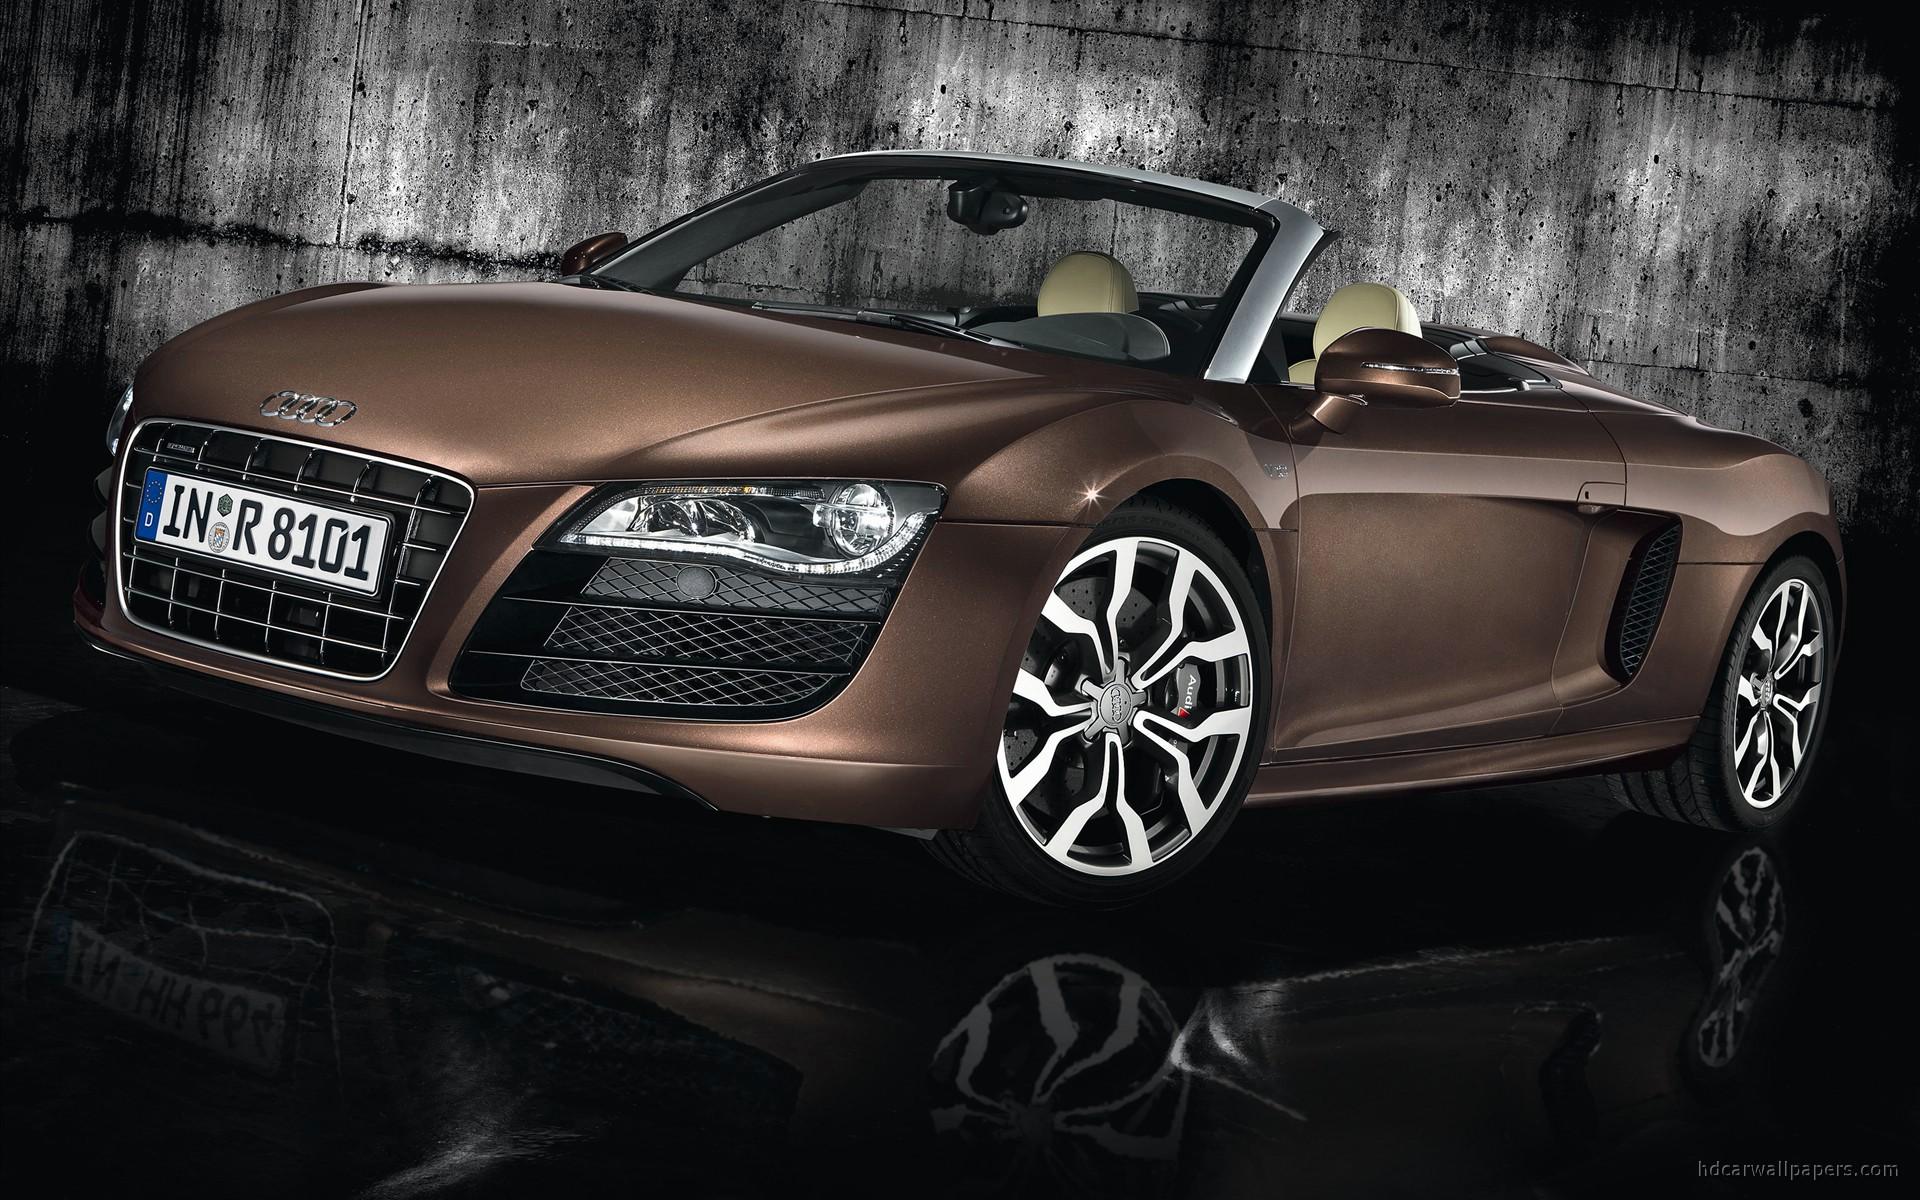 2011 Audi R8 Spyder 5.2 FSI Quattro Wallpaper   HD Car ...